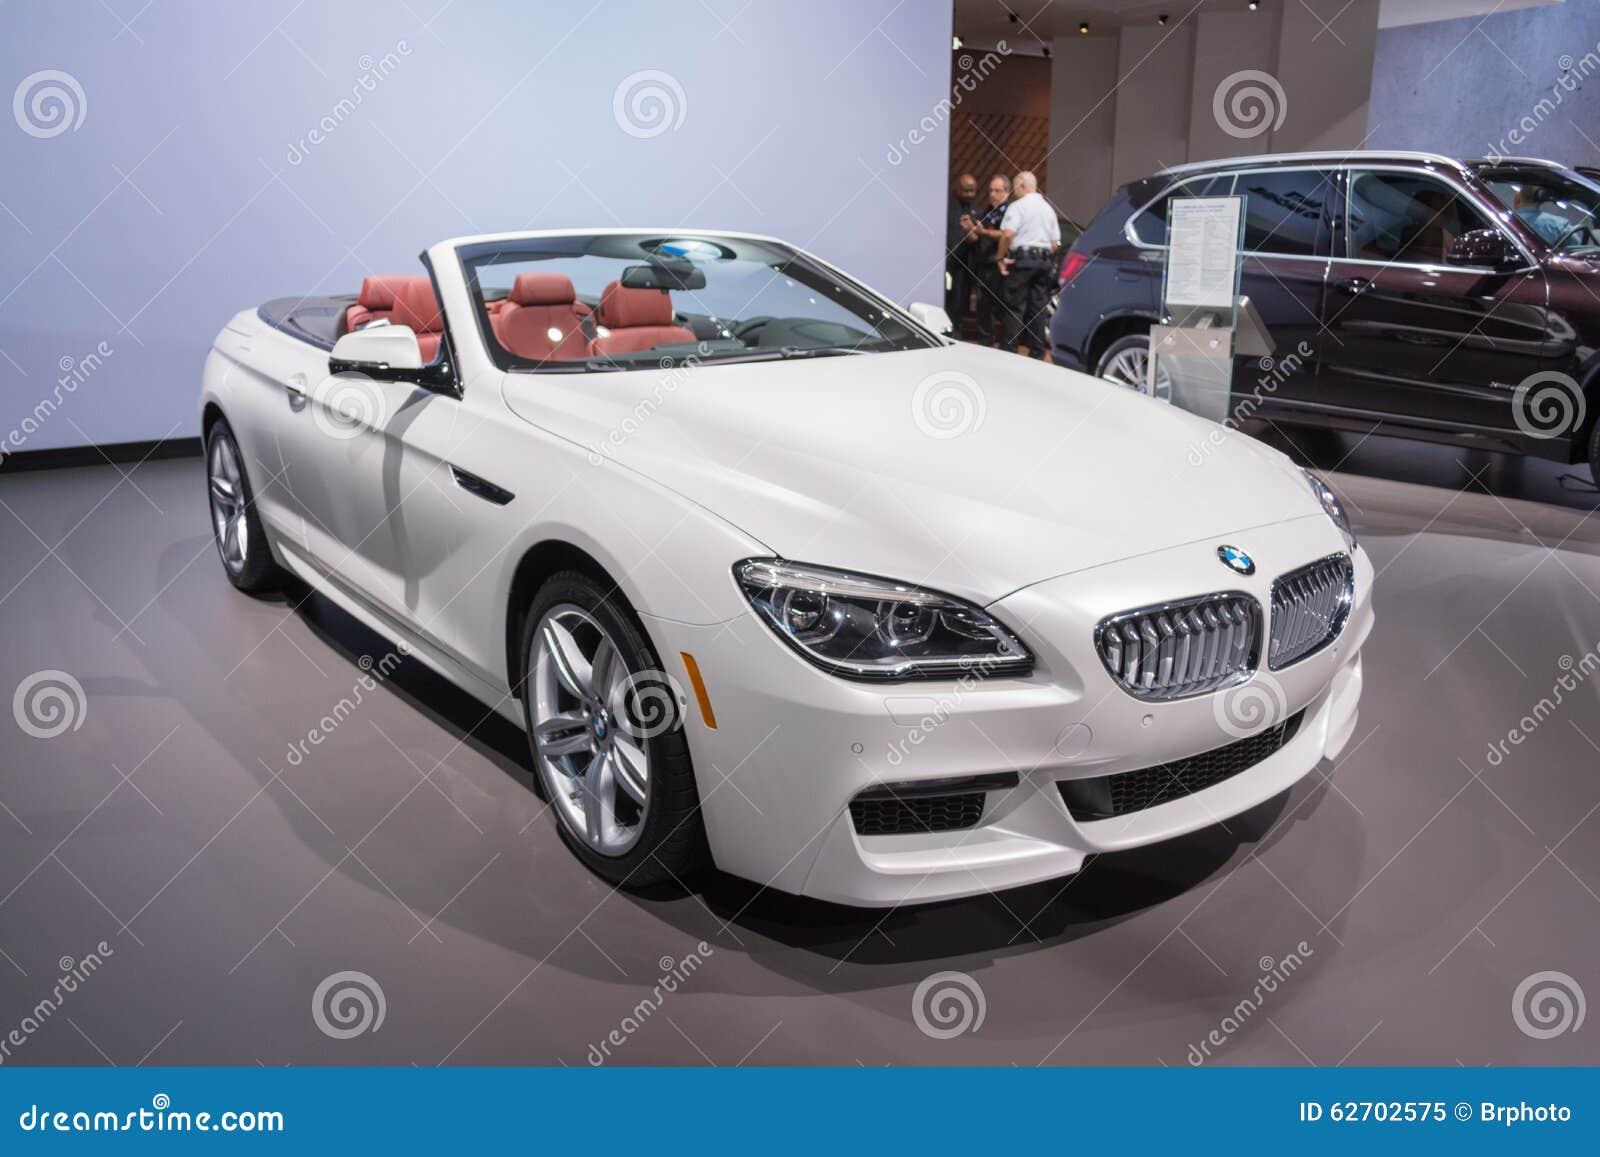 BMW Xdrive 650 ι